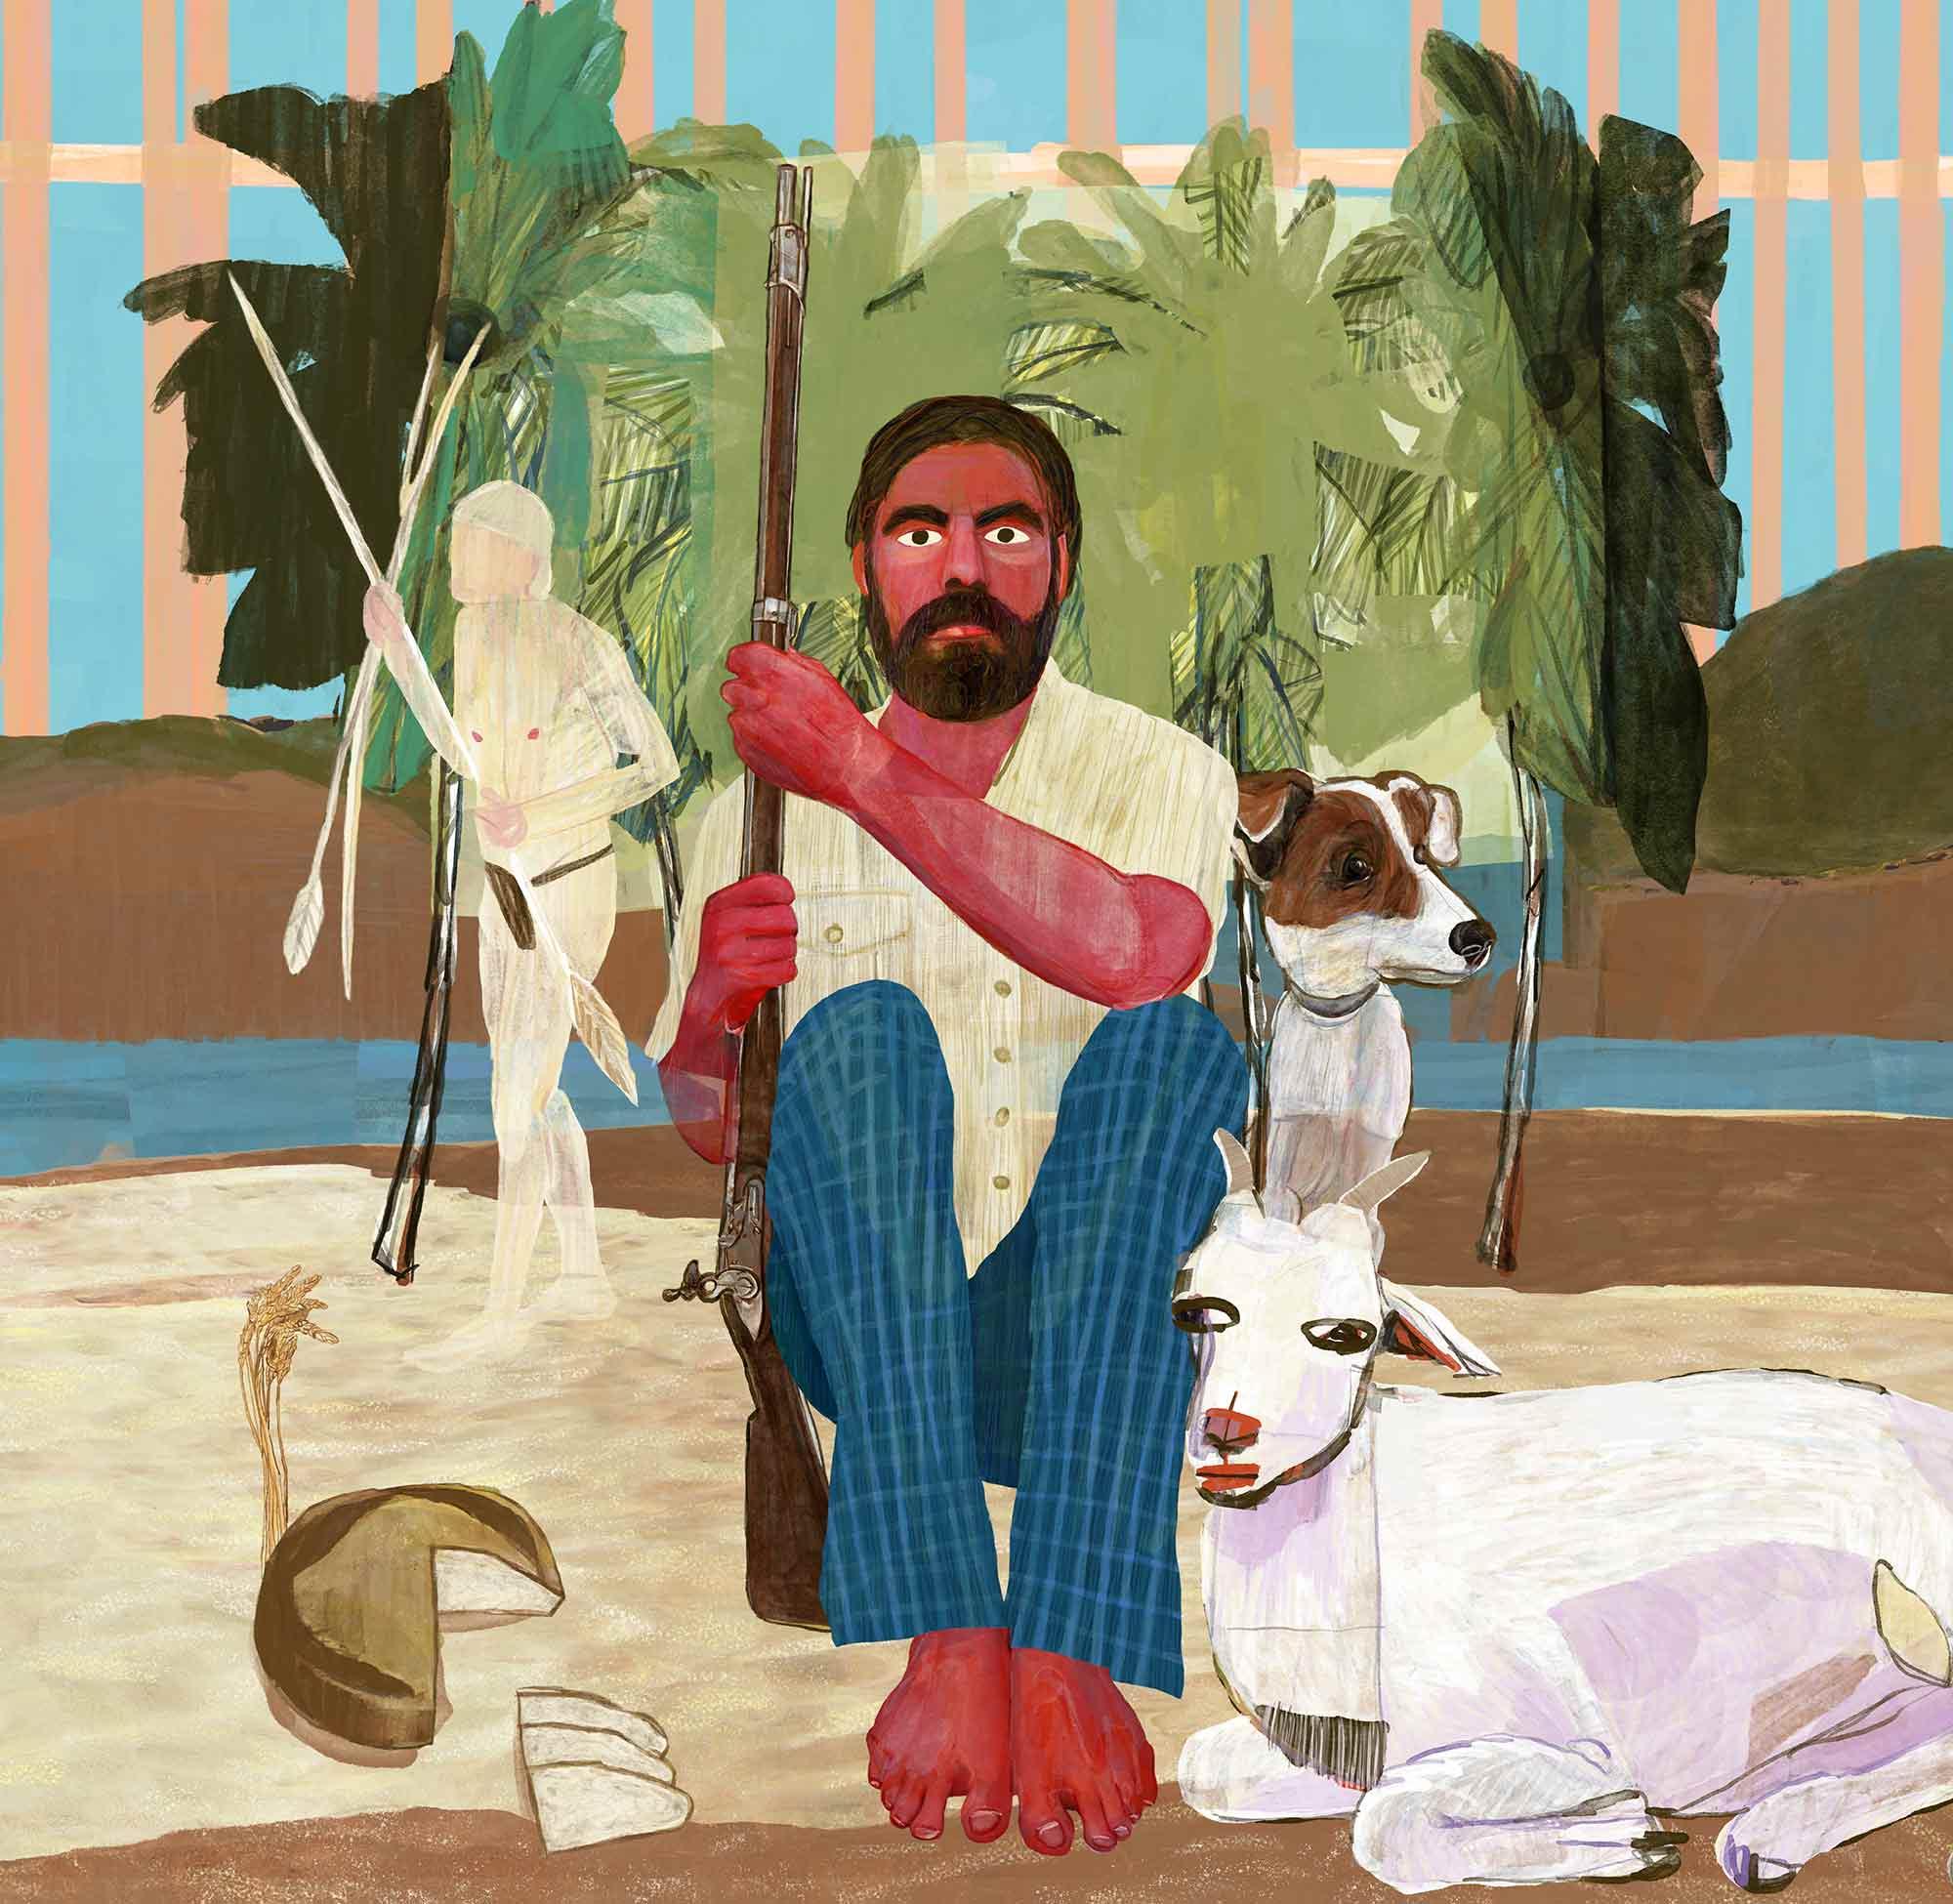 Mario Jodra illustration Art - The life and adventures of Robinson Crusoe by Daniel Defoe.